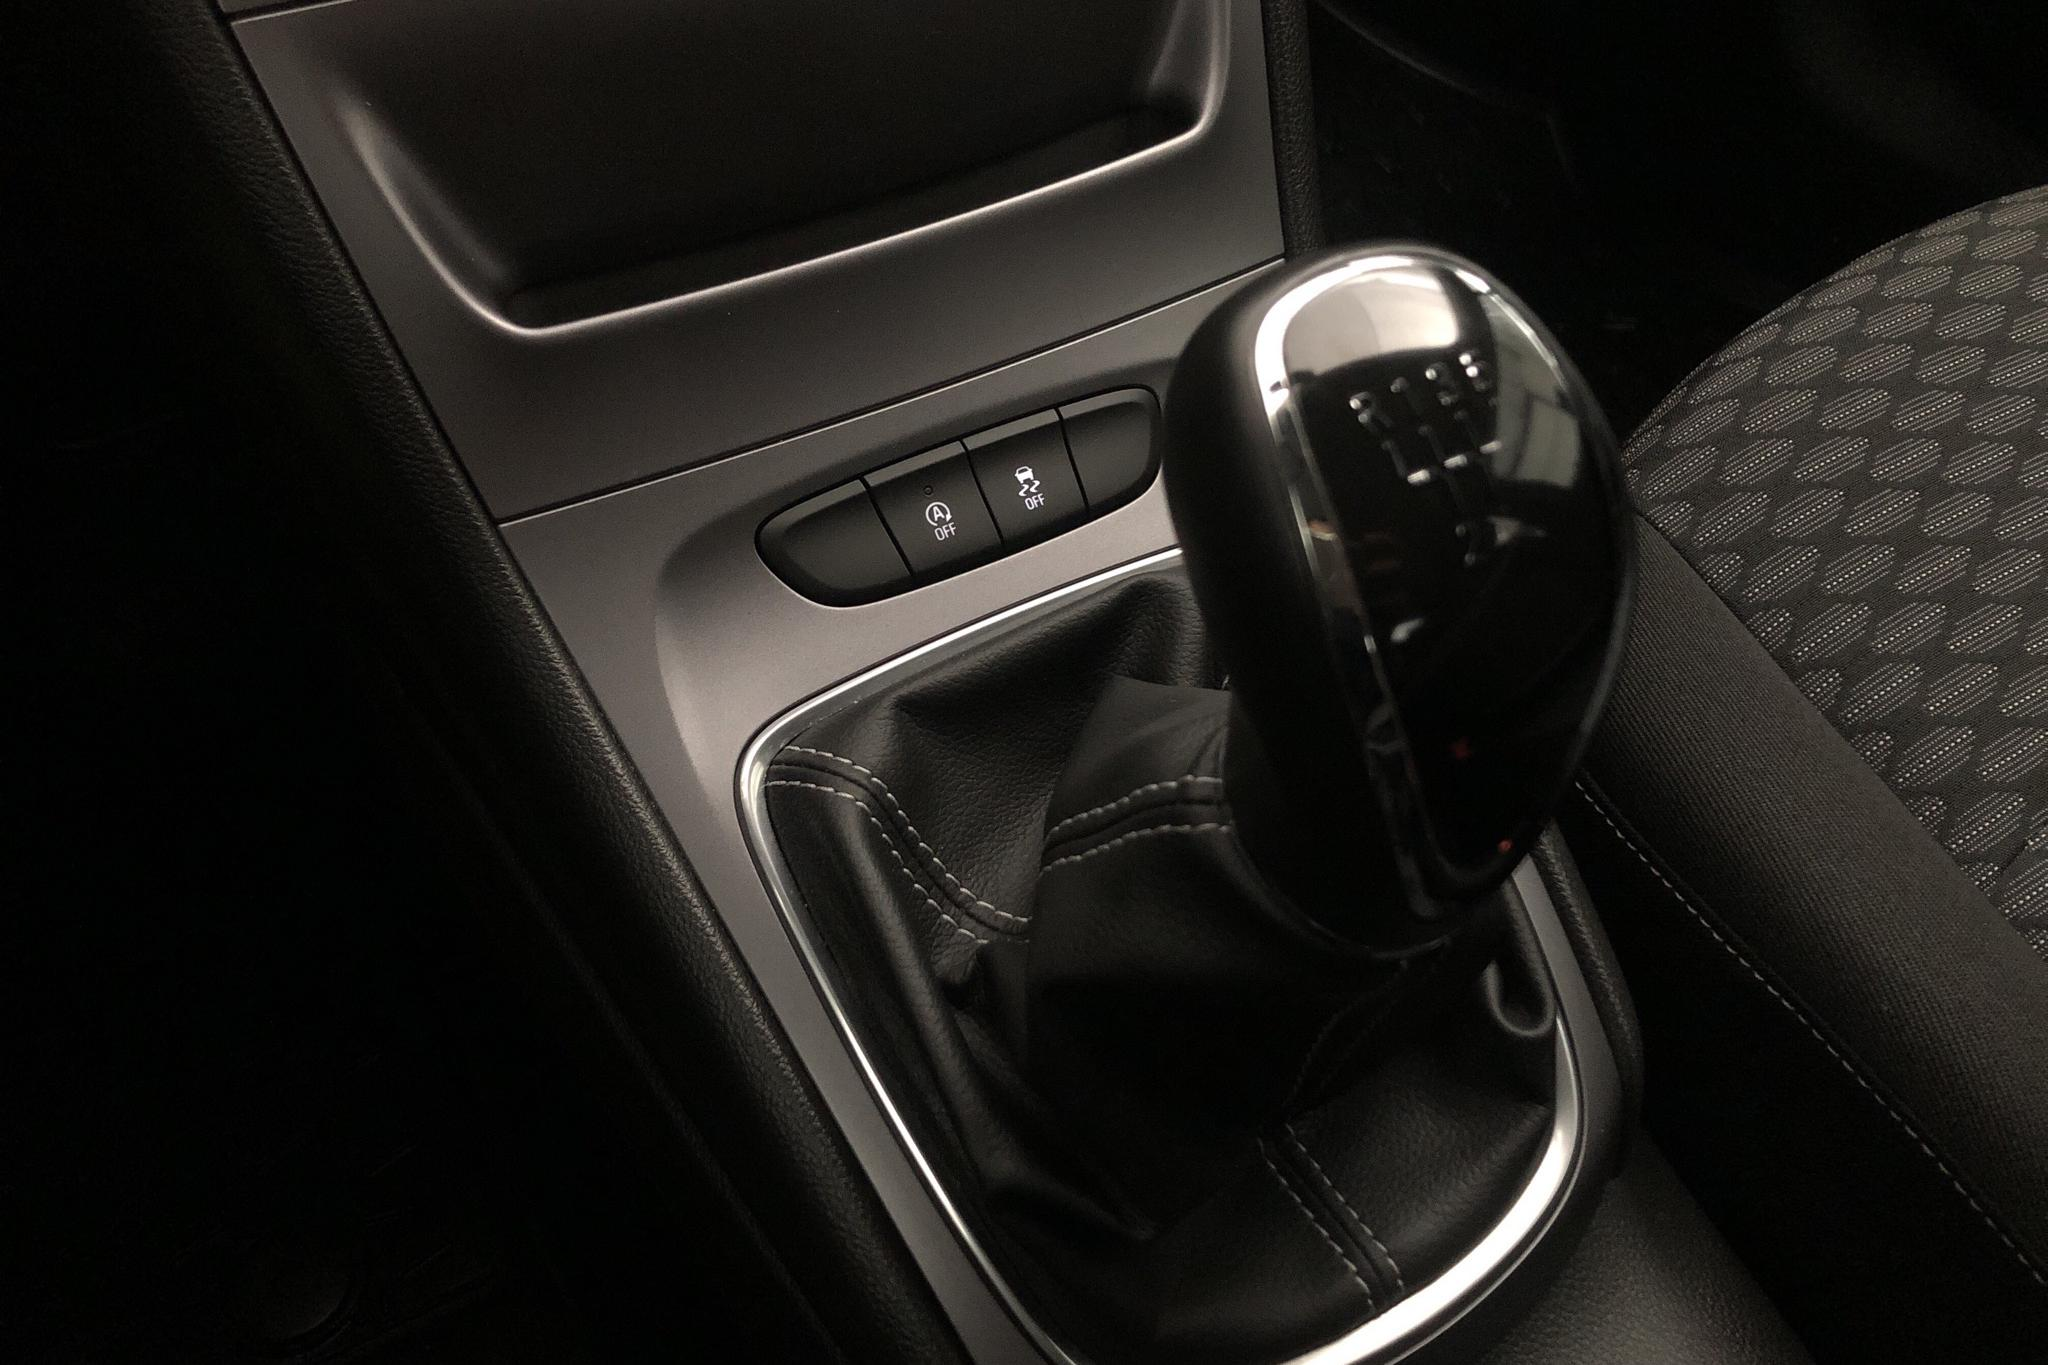 Opel Astra 1.0 Turbo ECOTEC 5dr (105hk) - 6 496 mil - Manuell - blå - 2016